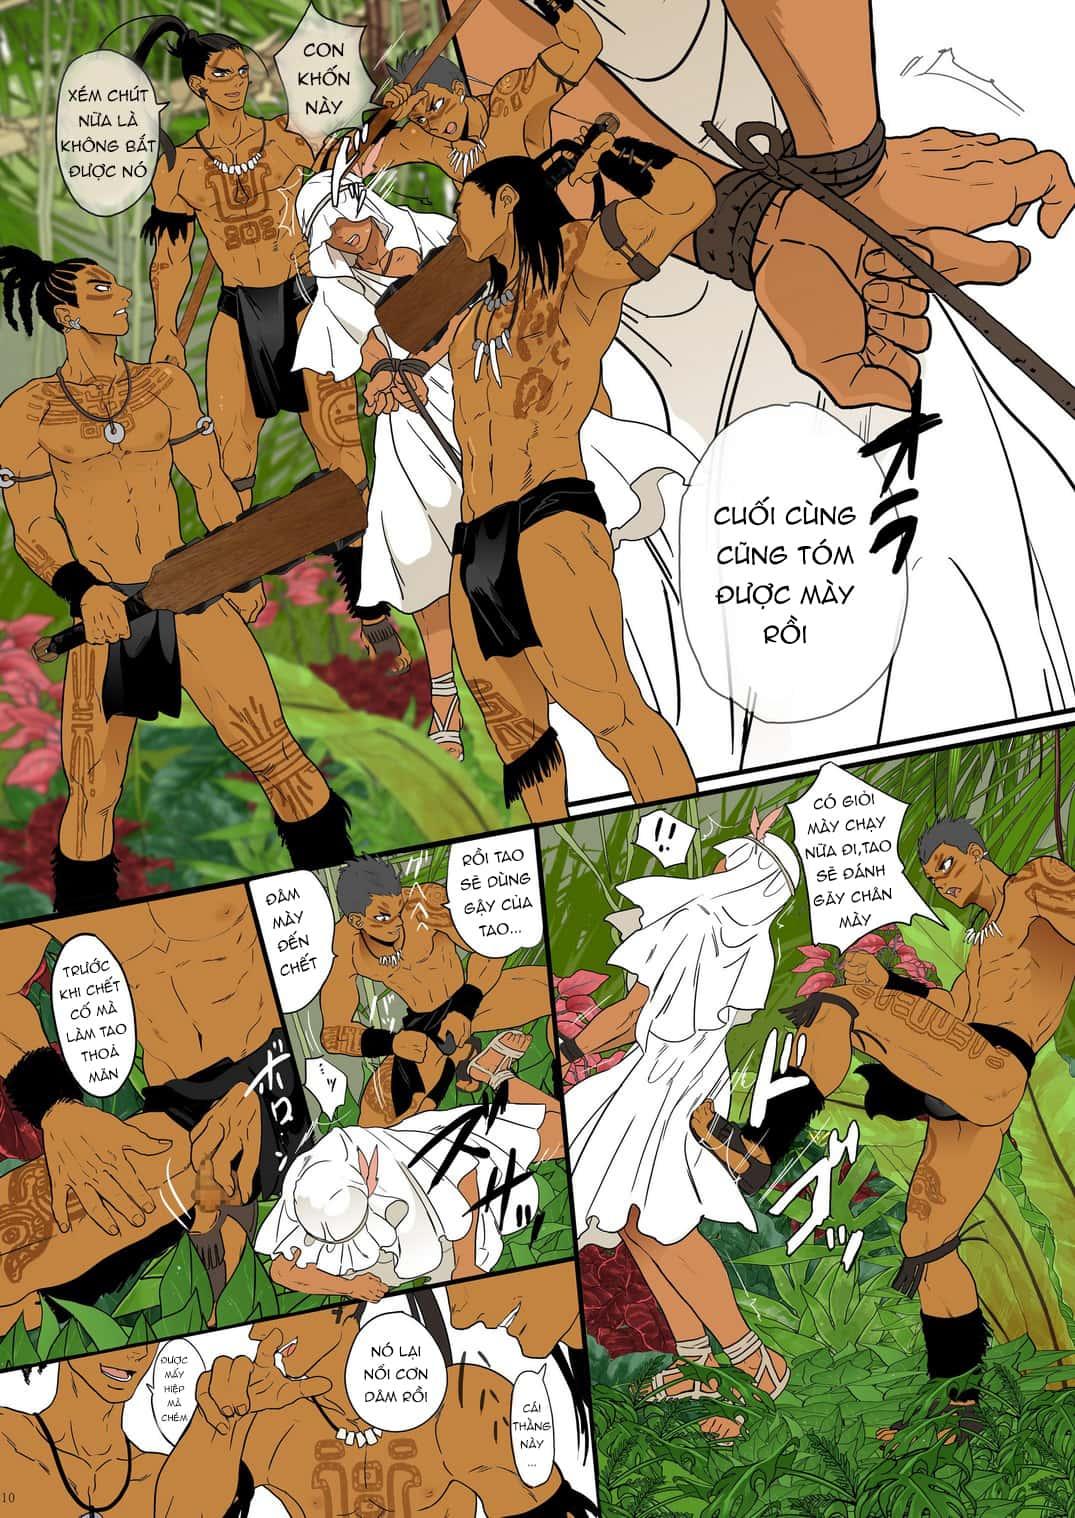 [Goma Saba] LỄ HIẾN TẾ HOAN LẠC - Tác giả Goma Saba - Trang 10